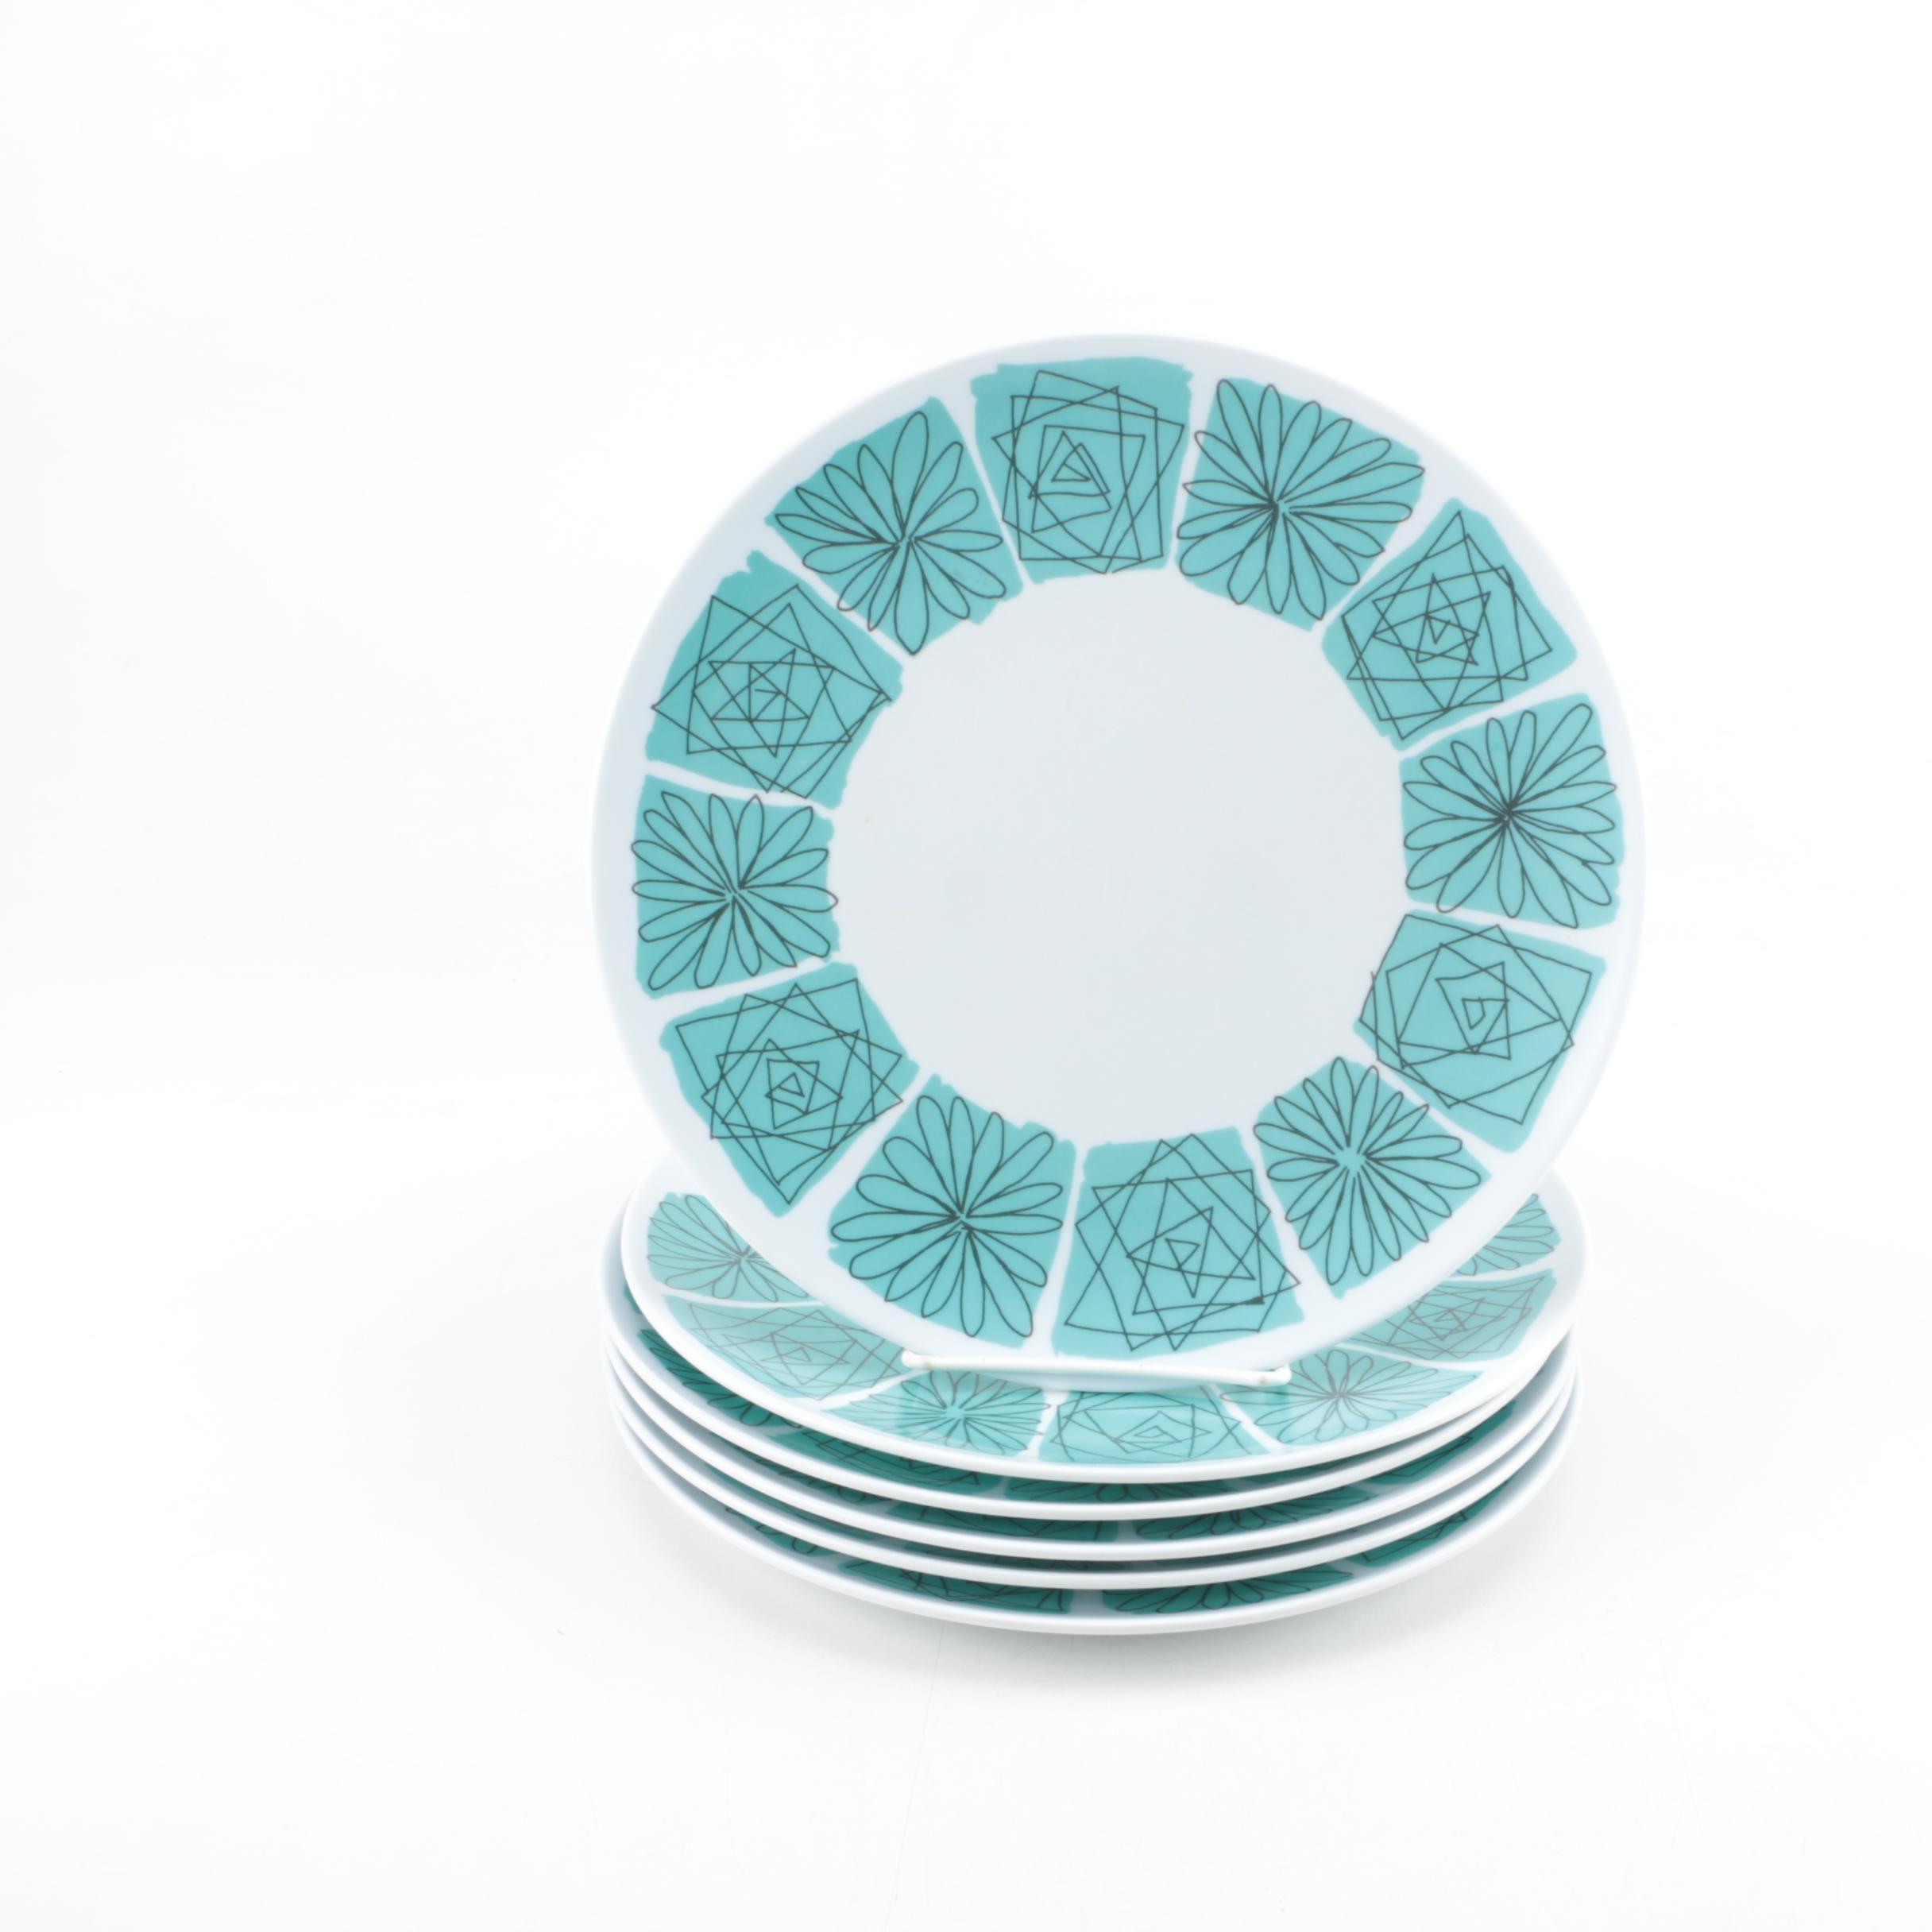 Texas-Ware Melamine Plates